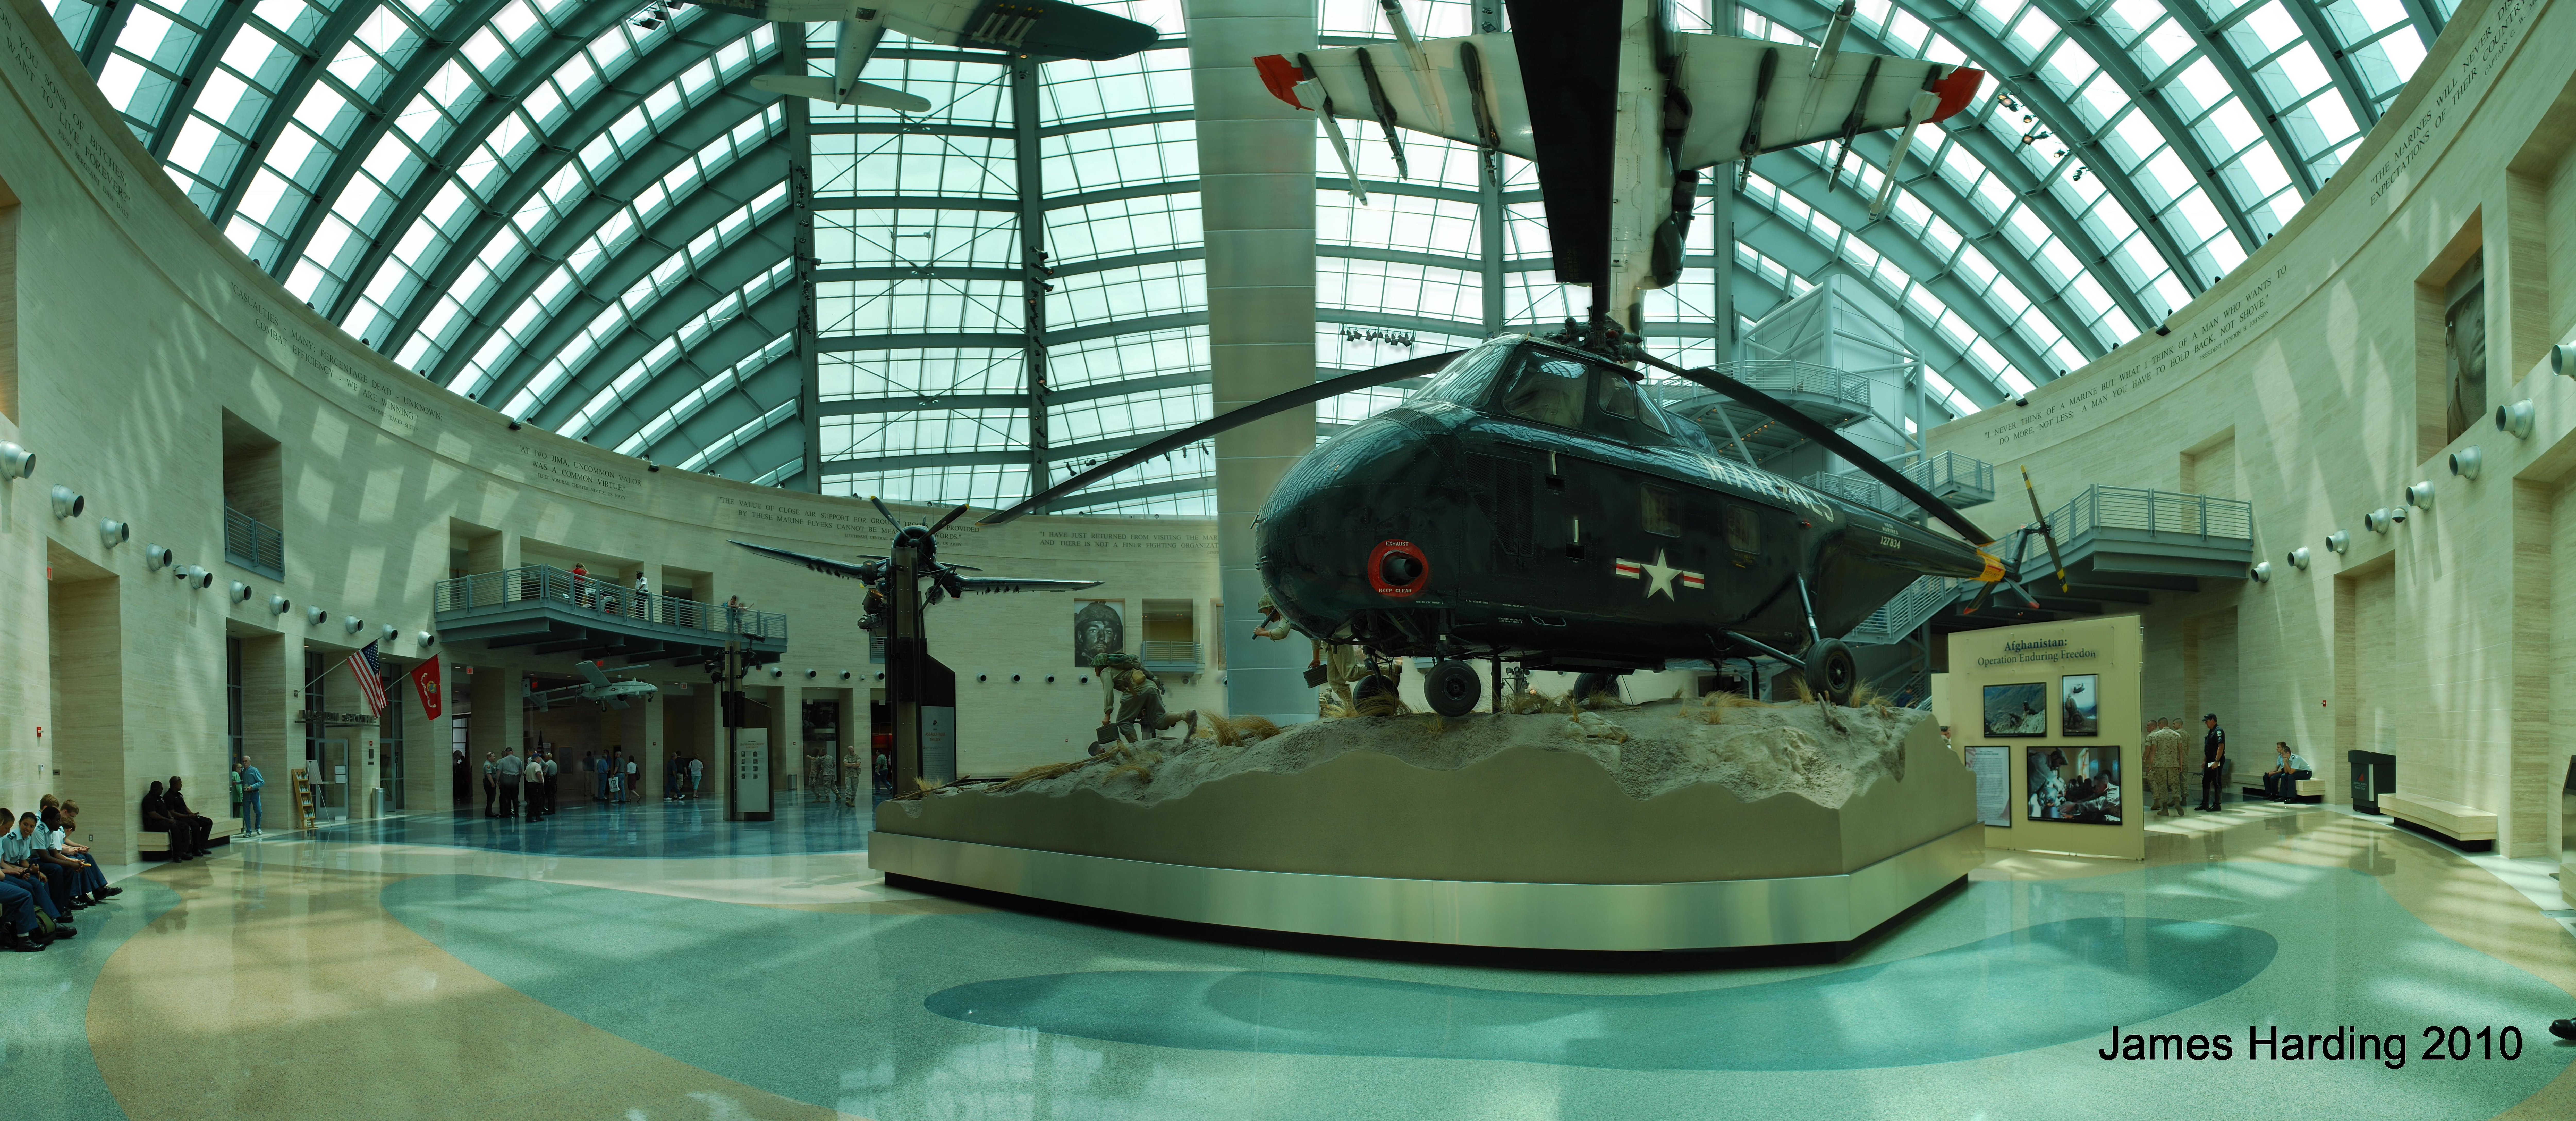 USMC Museum PANORAMIC by nighthawk419 on DeviantArt